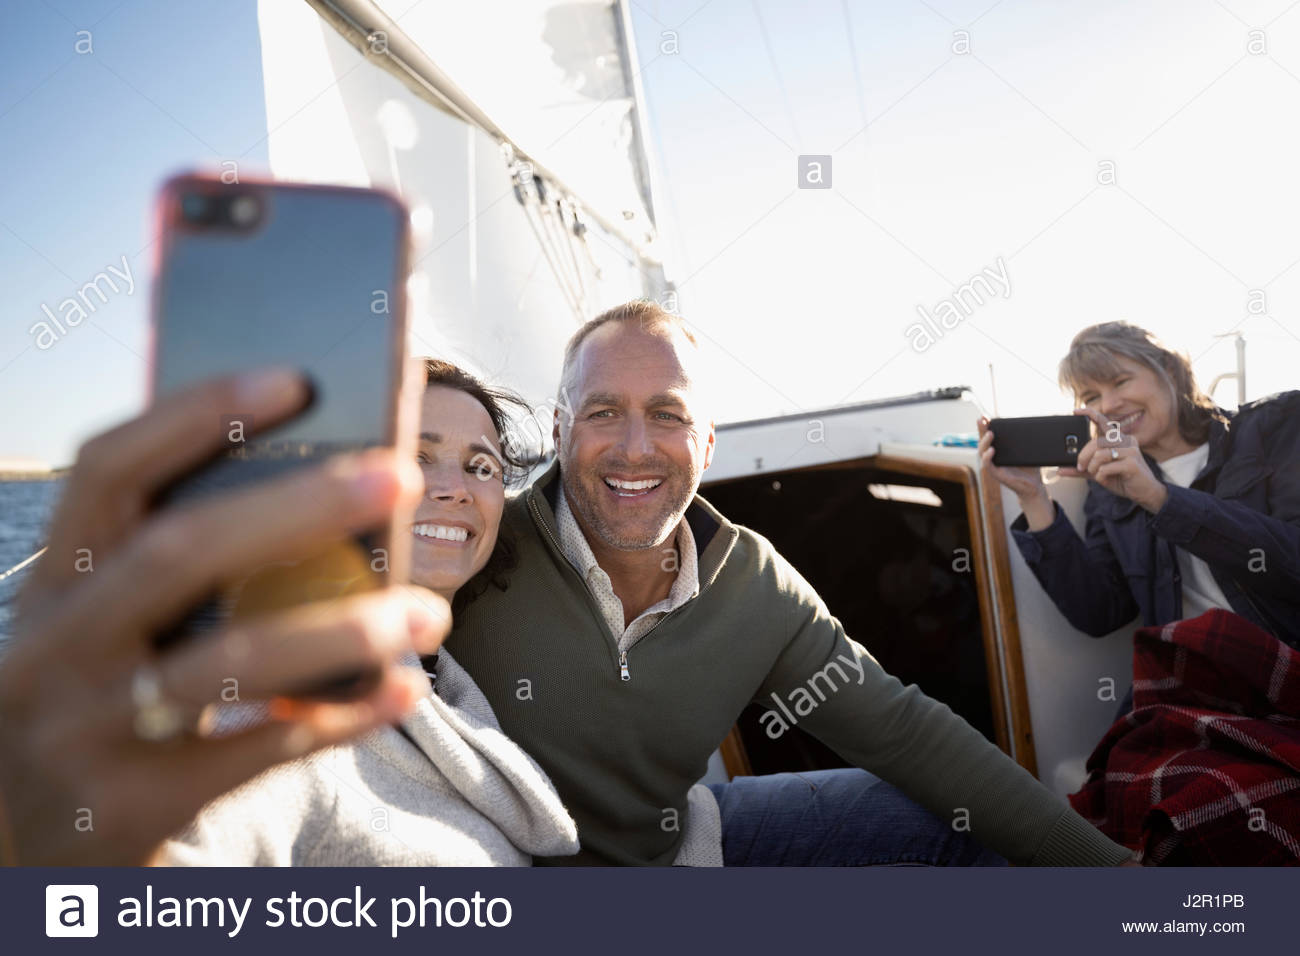 Senior couple with camera phone taking selfie on sailboat - Stock Image